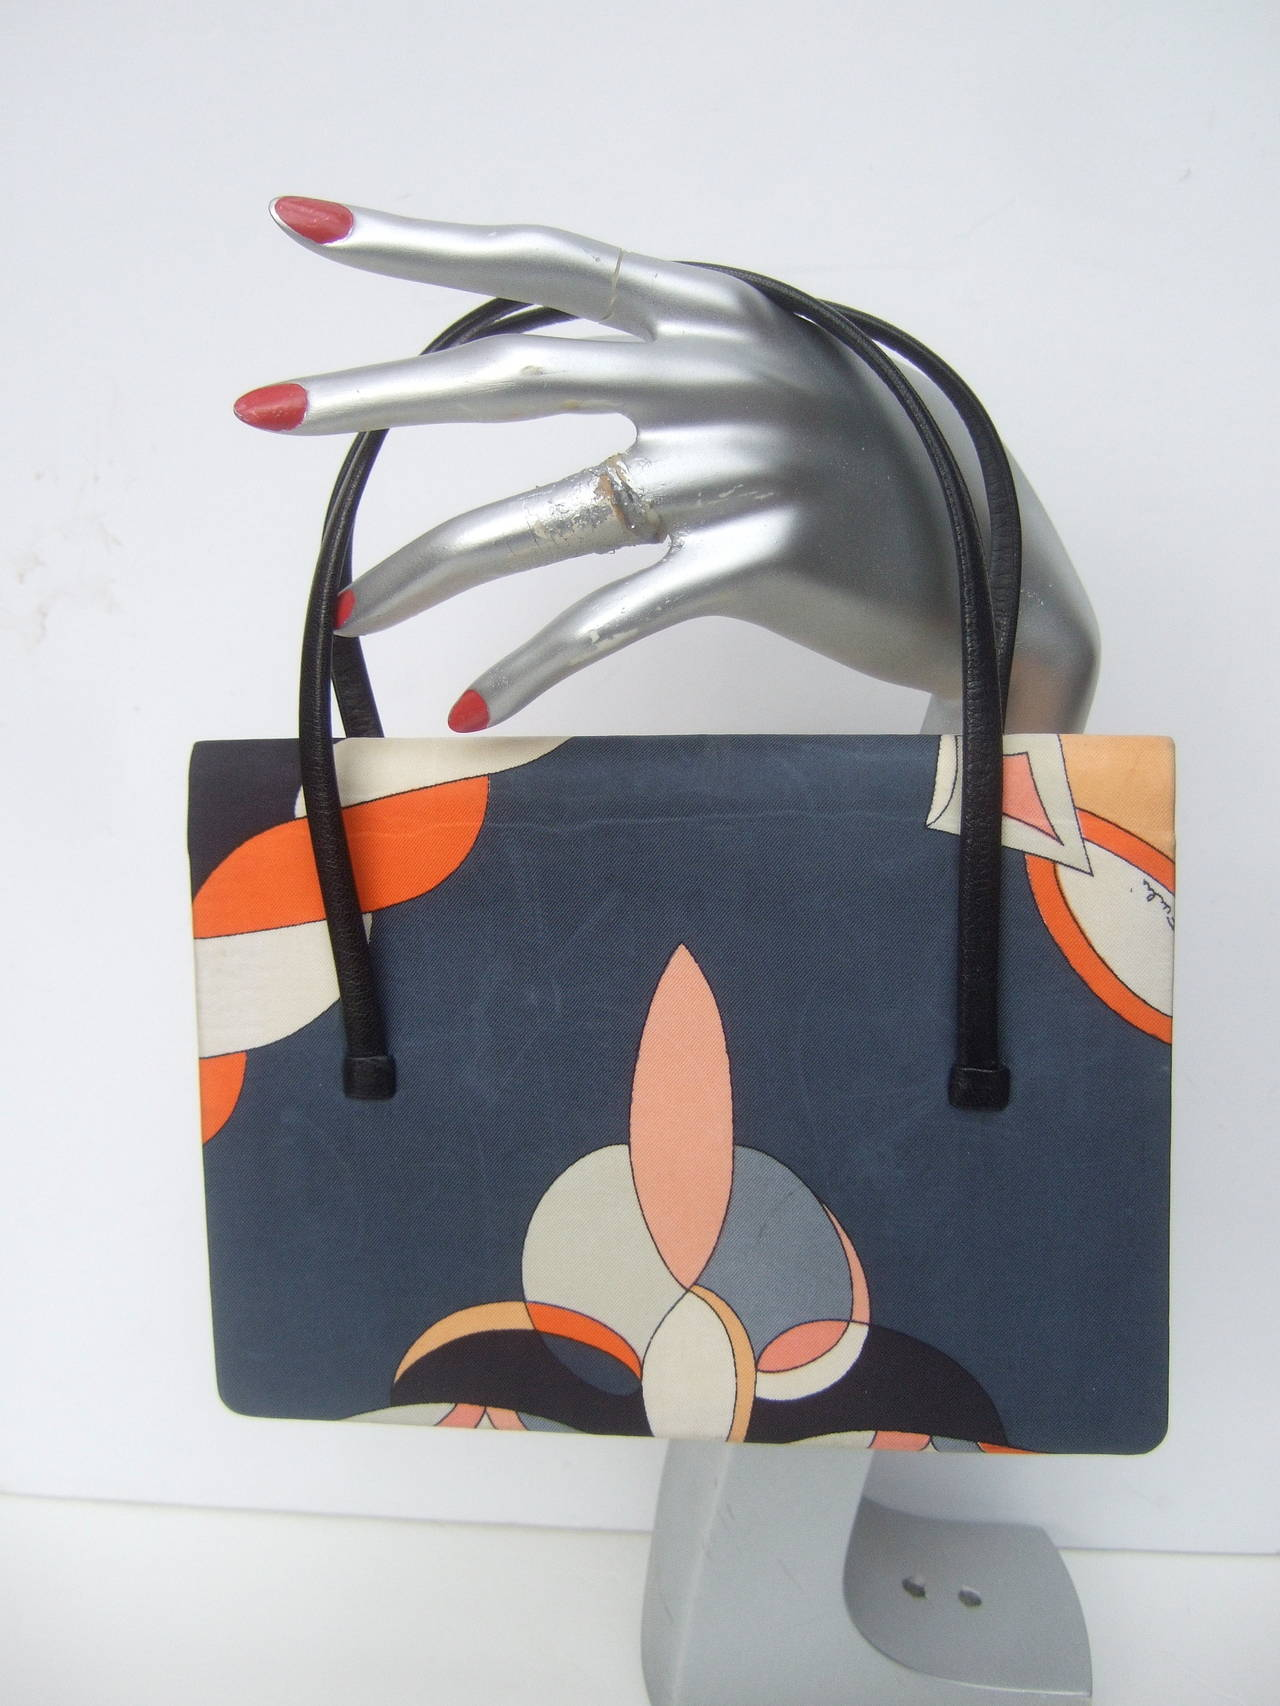 Emilio Pucci Italy Silk Diminutive Envelope Style Handbag c 1970 For Sale 3